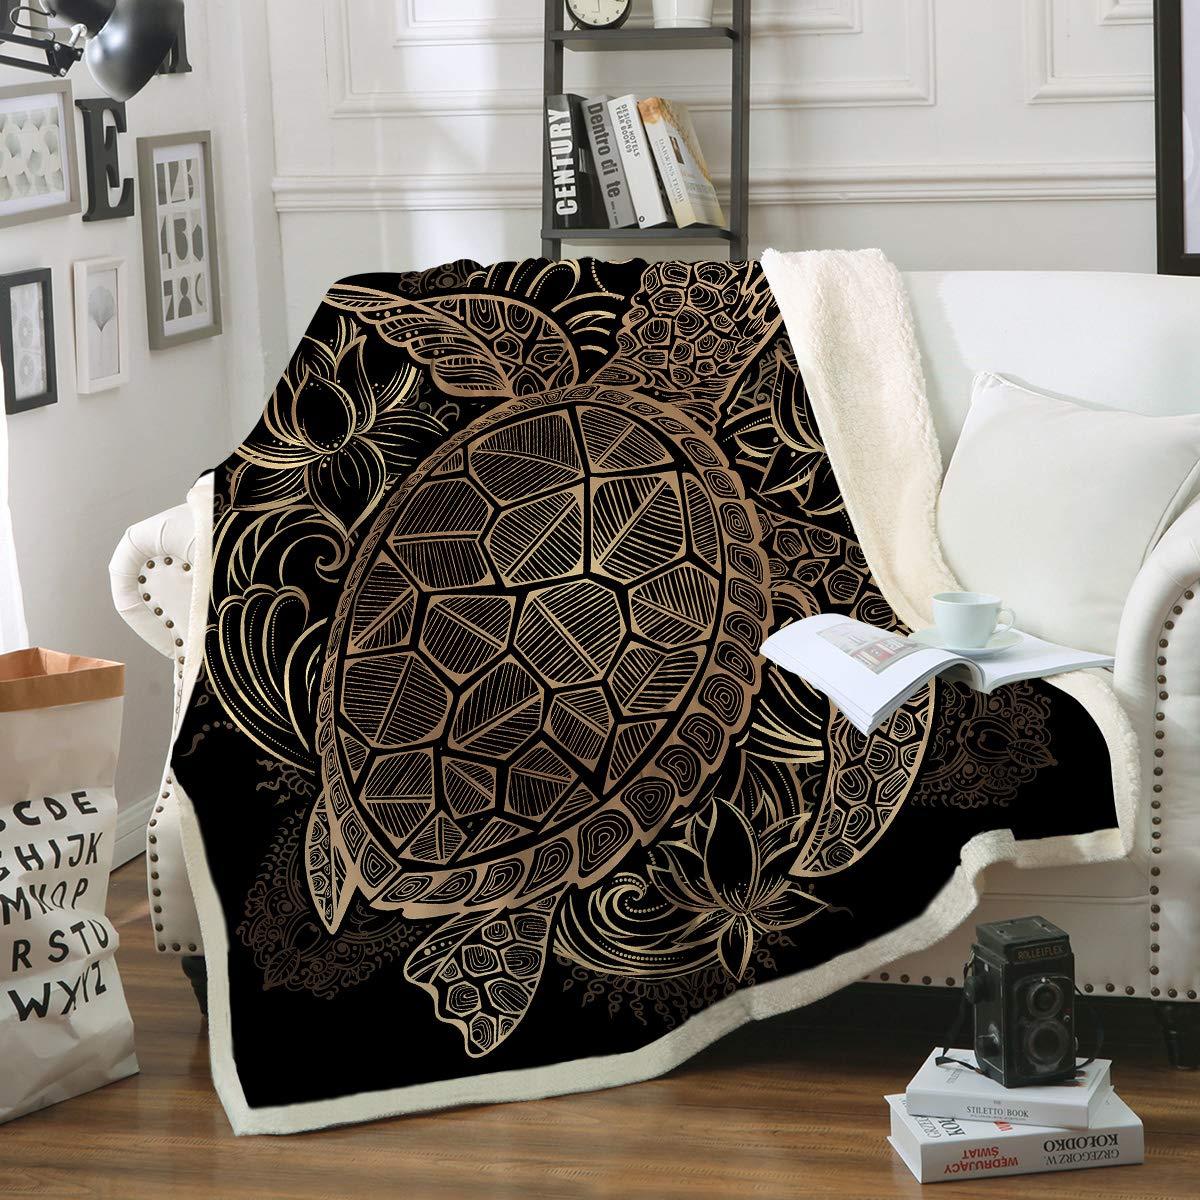 Sleepwish Gold Sea Turtle Blanket Kids Boys Boho Tortoise Floral Blanket Black and Golden Reversible Sherpa Fleece Blanket Queen 90'' X 90'' by Sleepwish